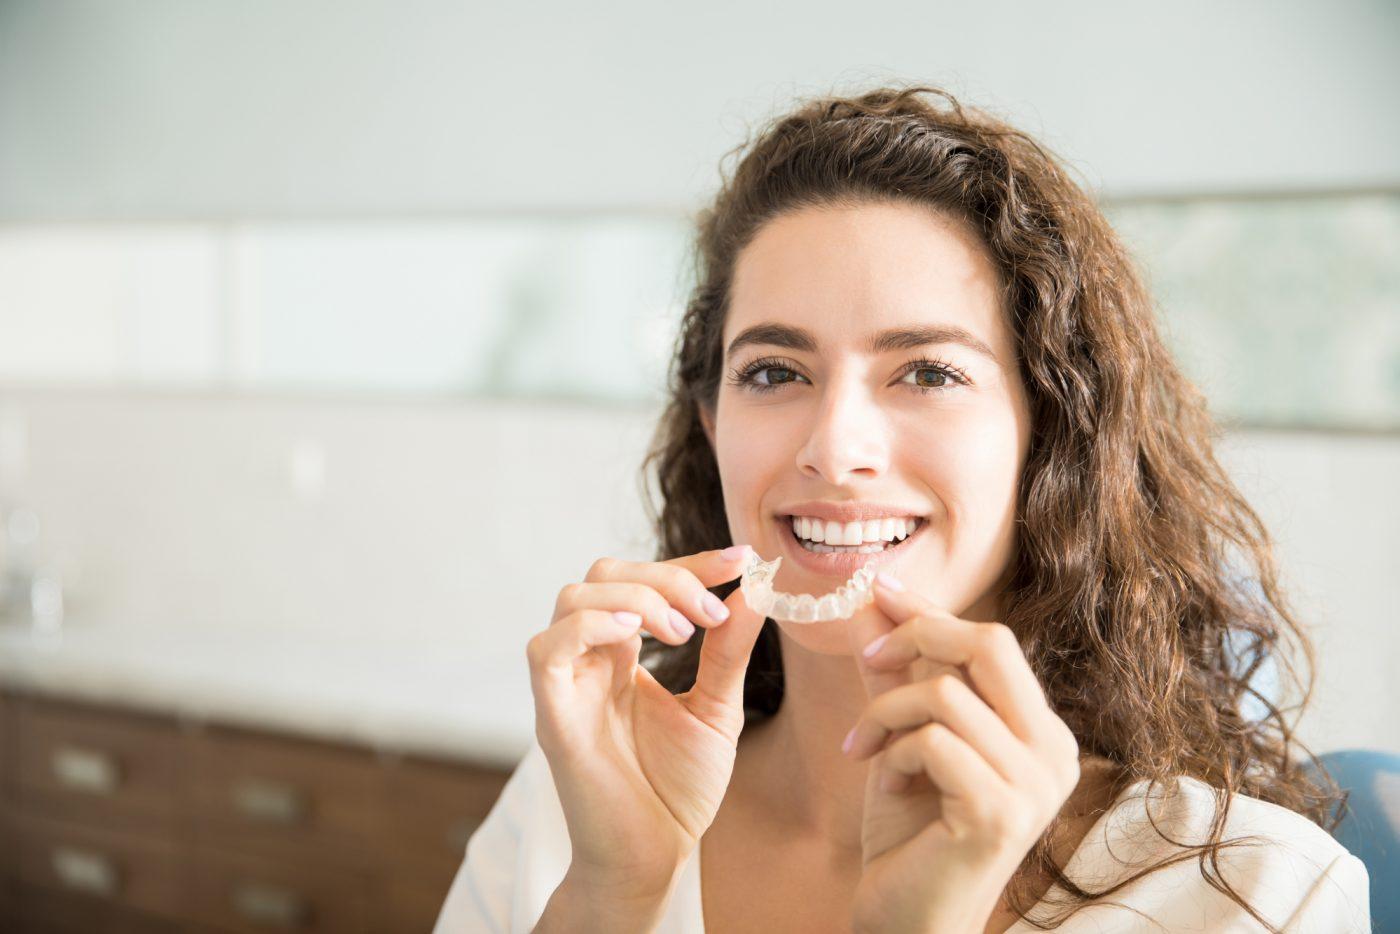 Portman Laura Jones Bw Dentists 006